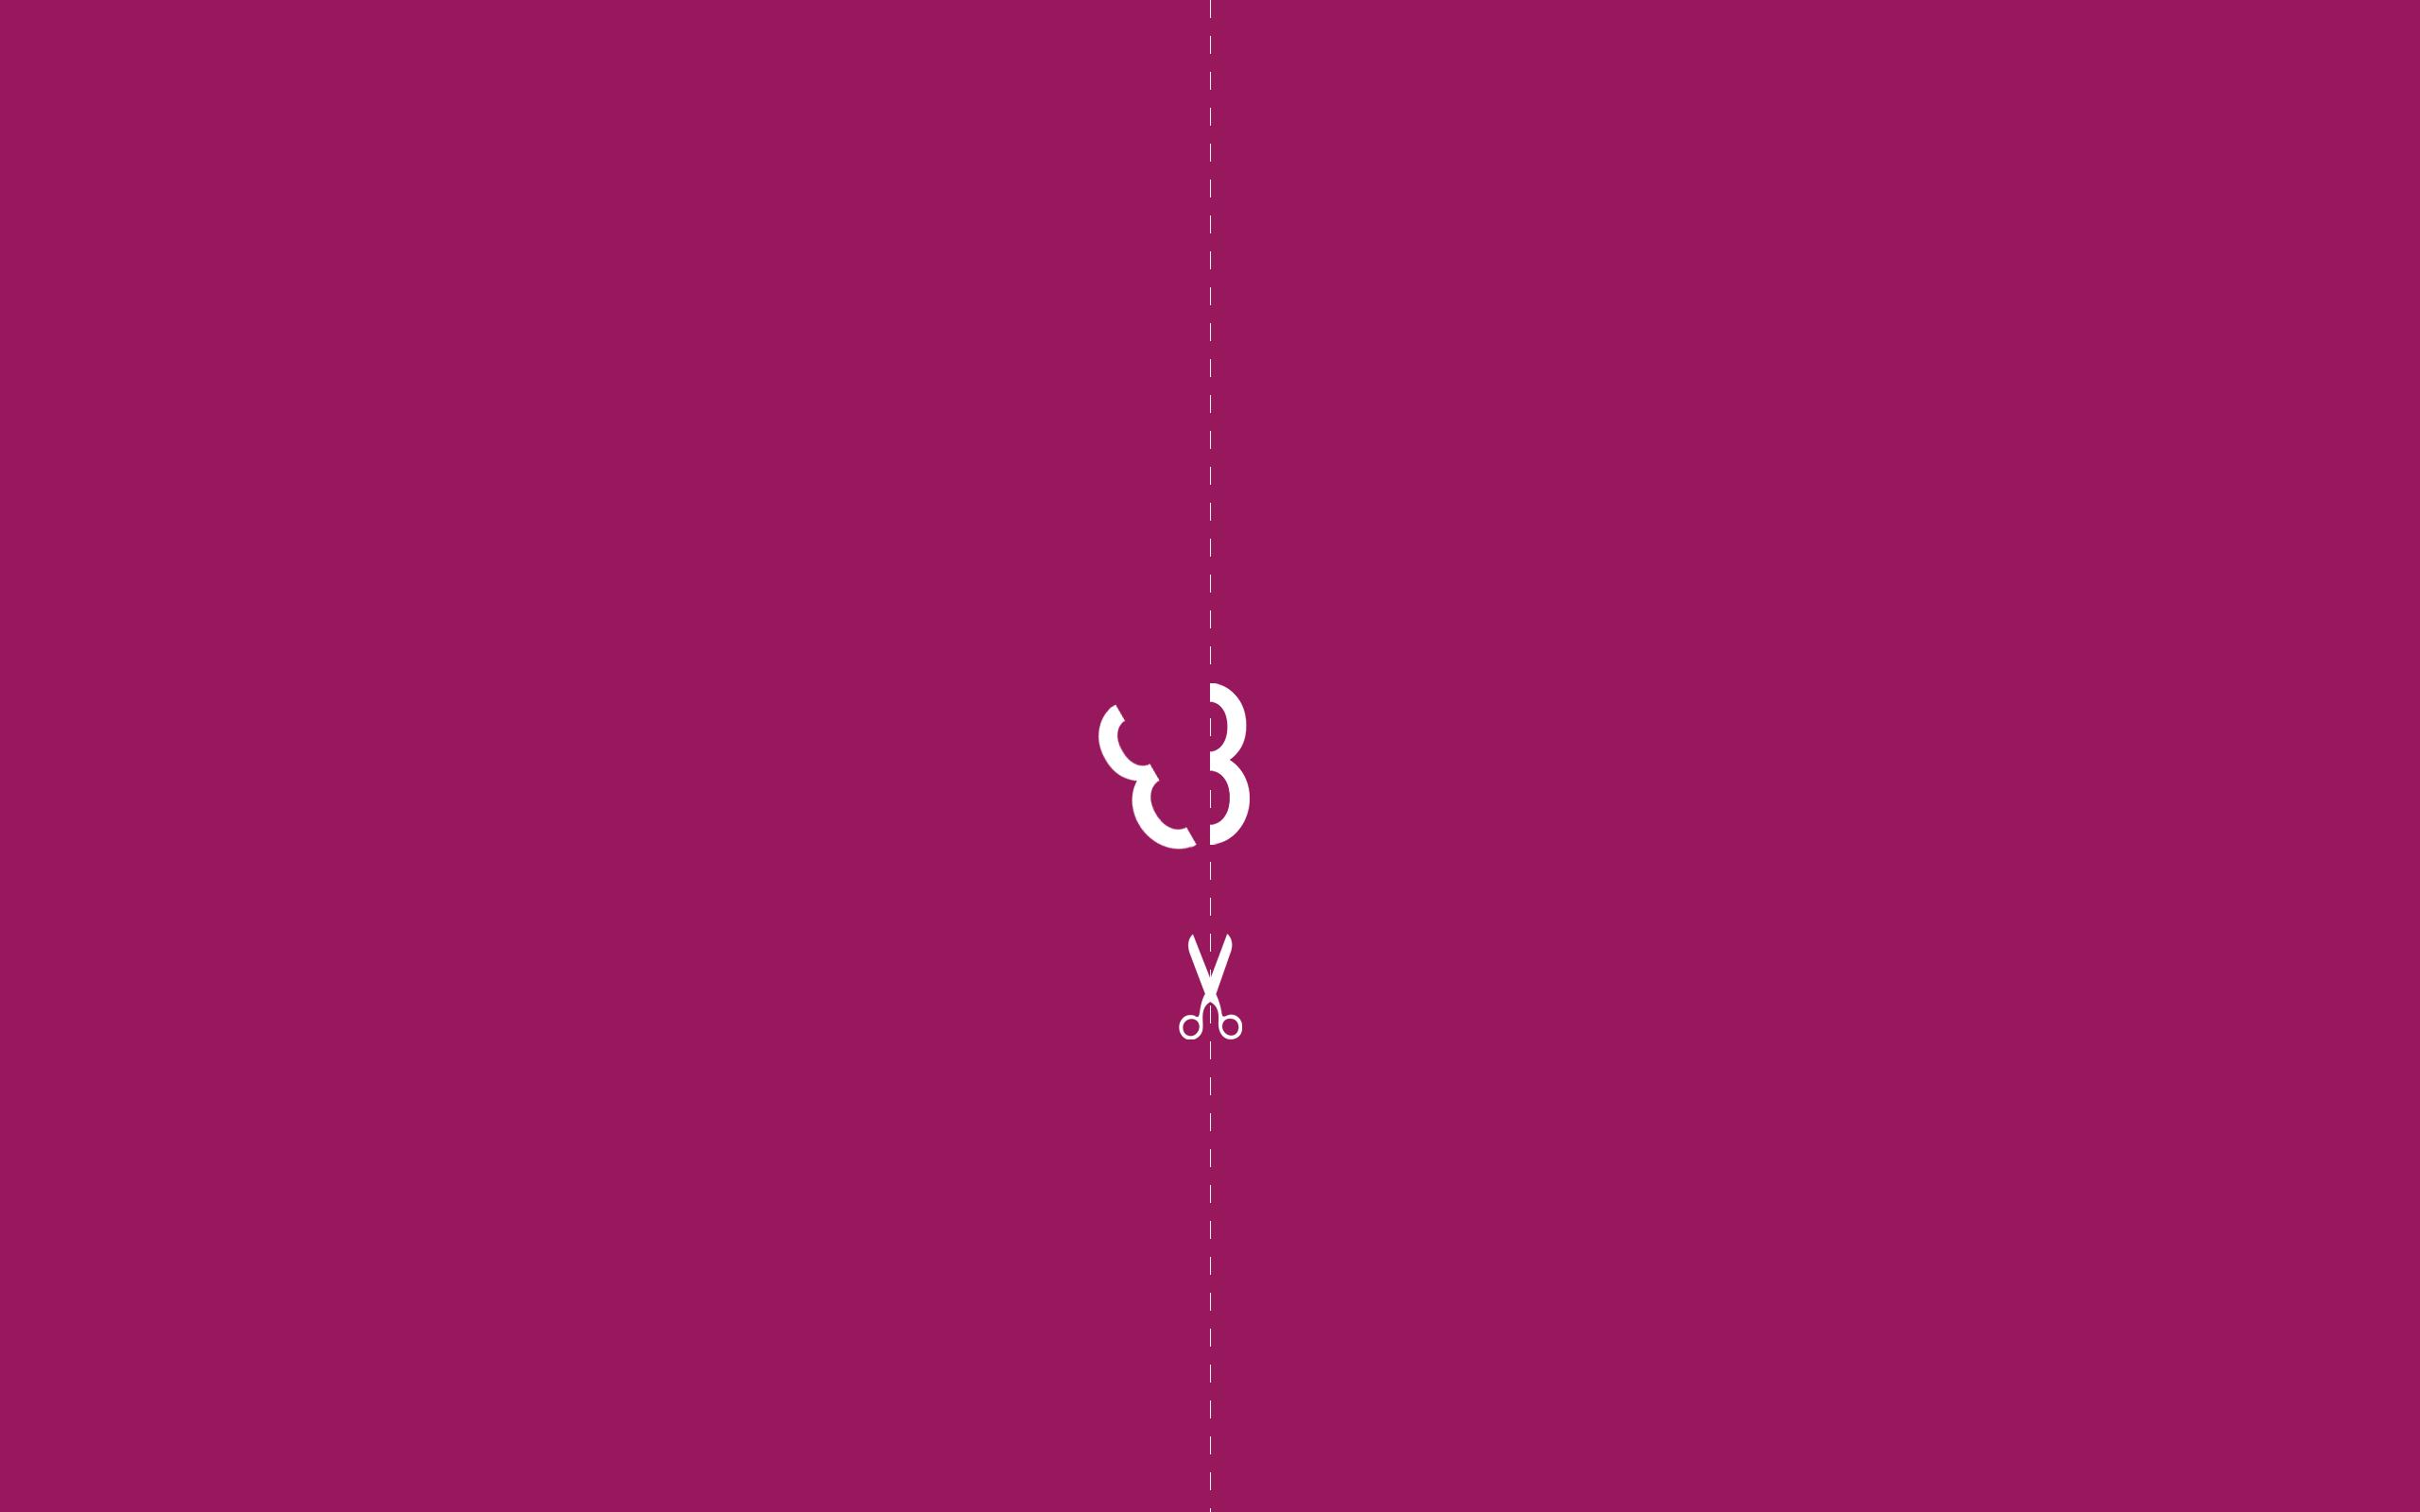 divided minimalist wallpaper violet | Minimalist wallpaper ...